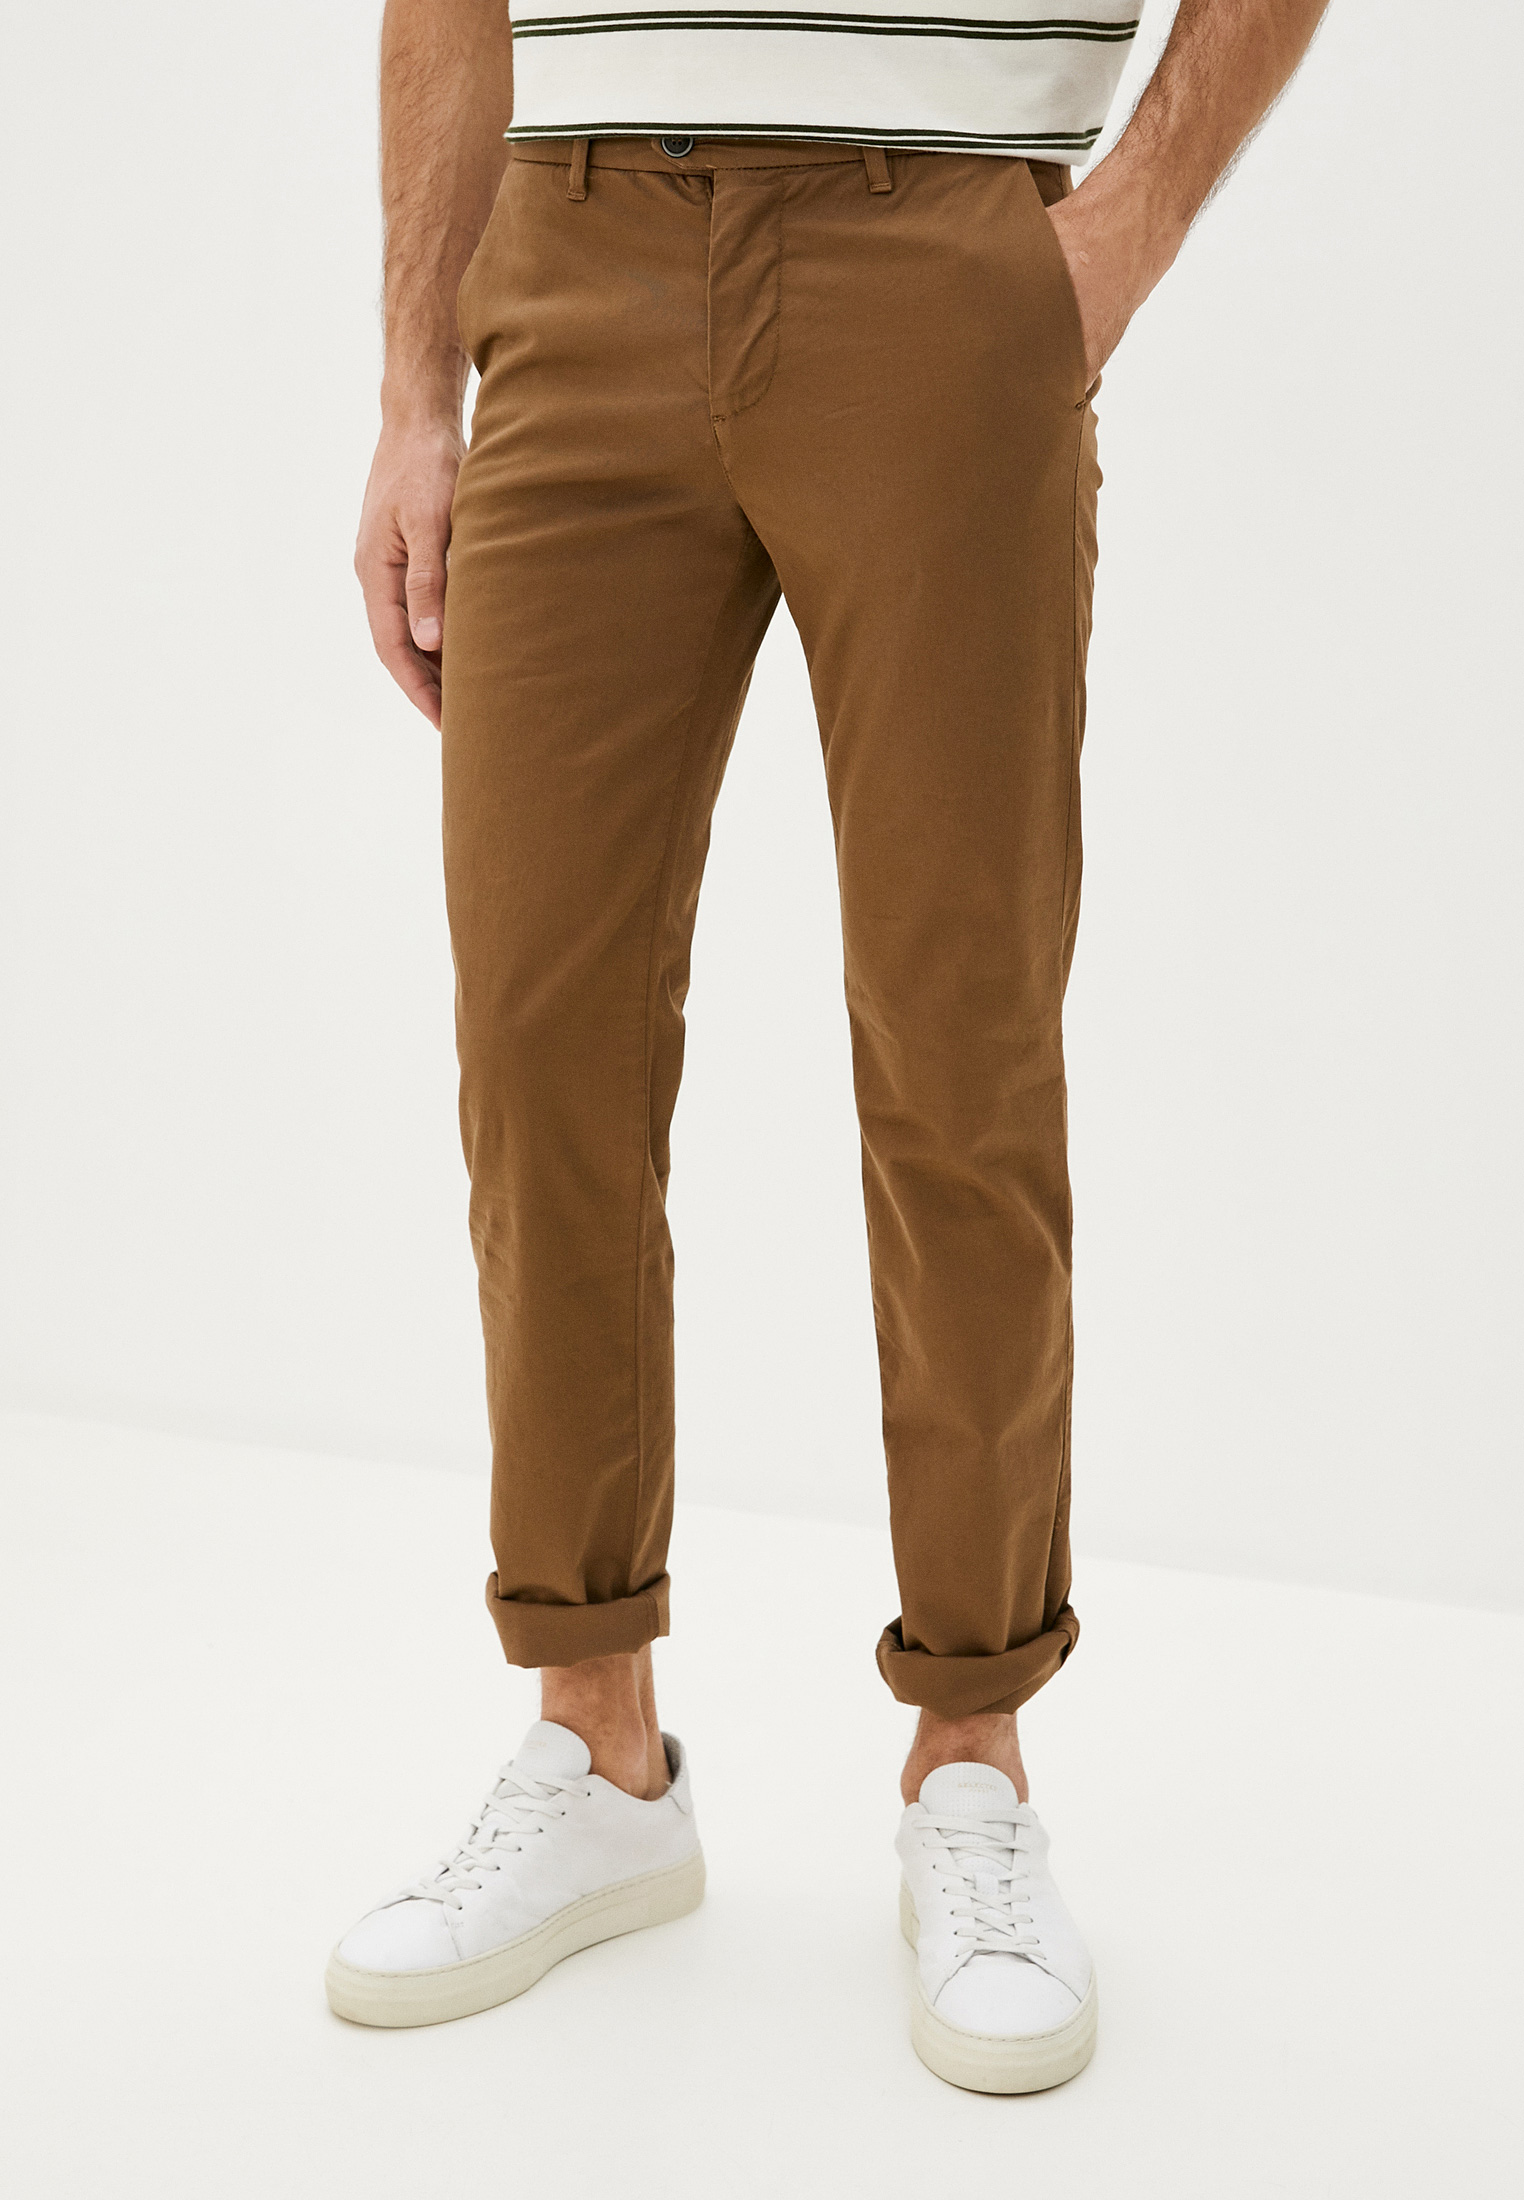 Мужские повседневные брюки United Colors of Benetton (Юнайтед Колорс оф Бенеттон) 4UN455GX8